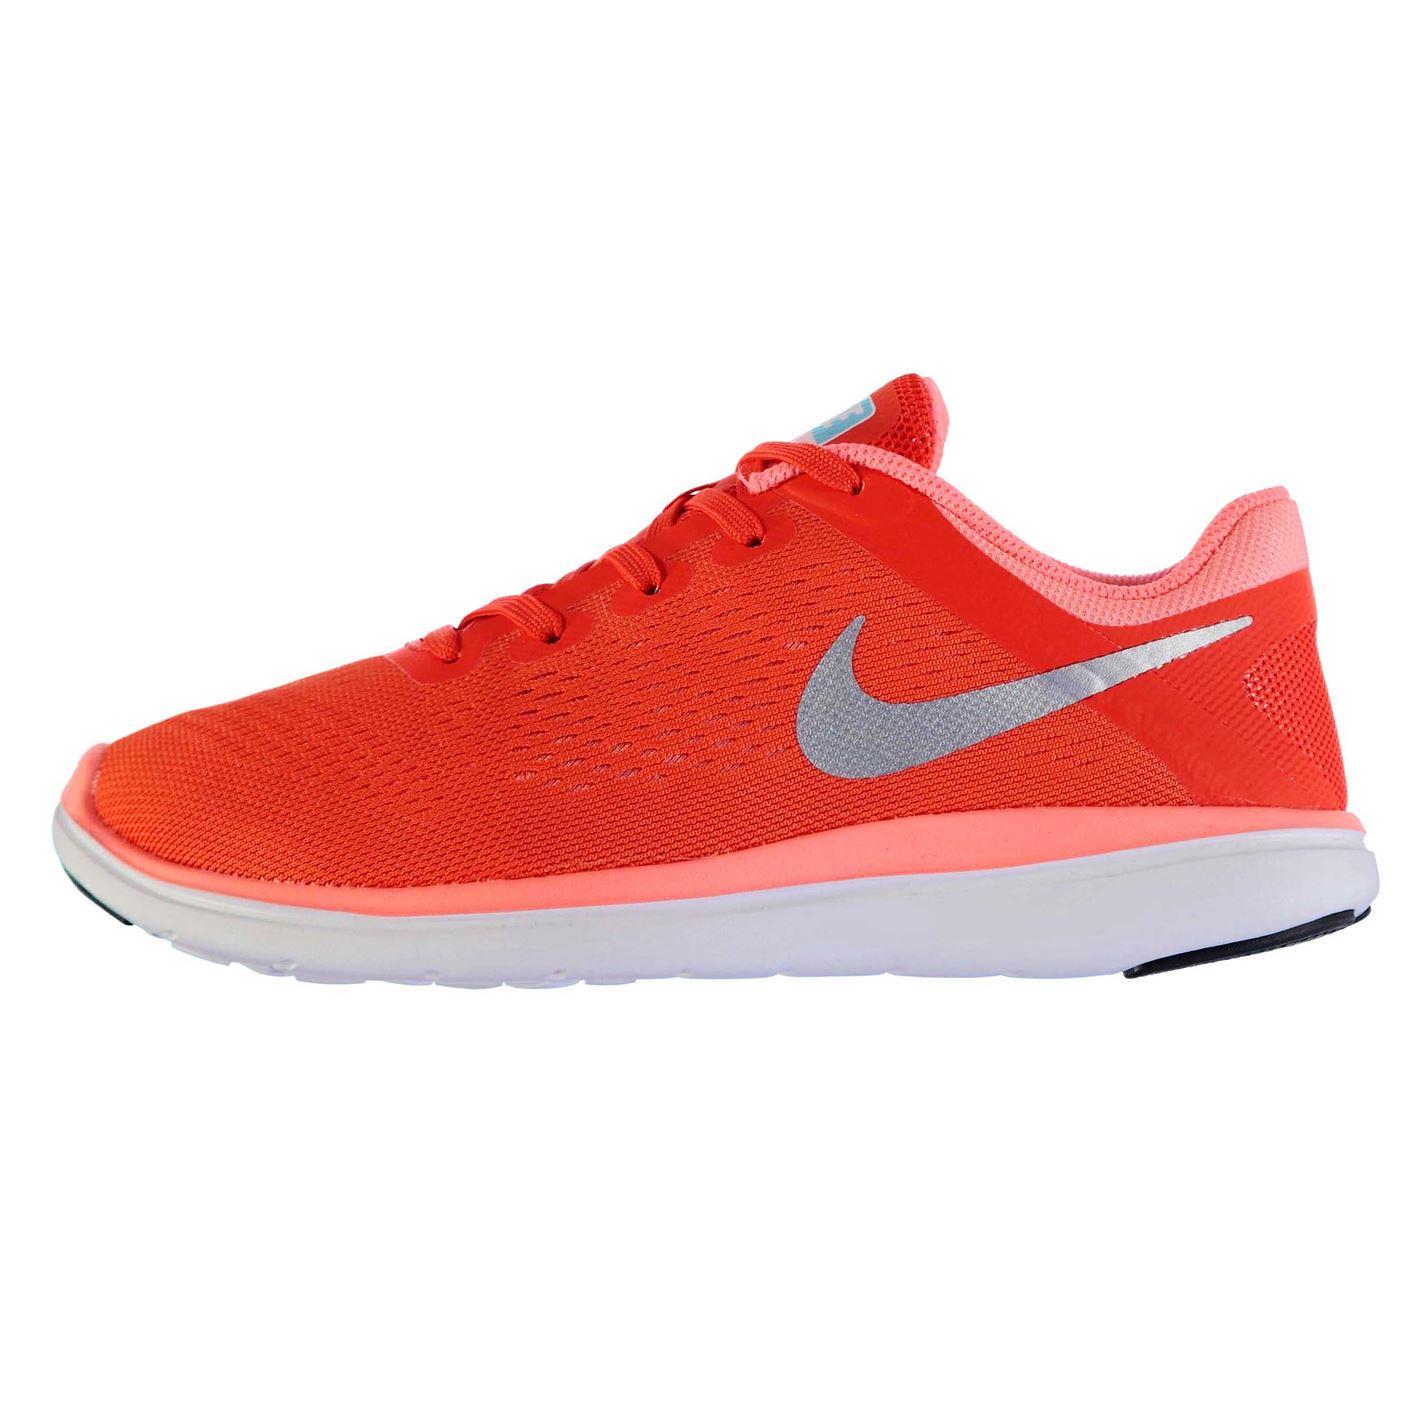 Nike Flex 2016 Run Girls Running Shoes